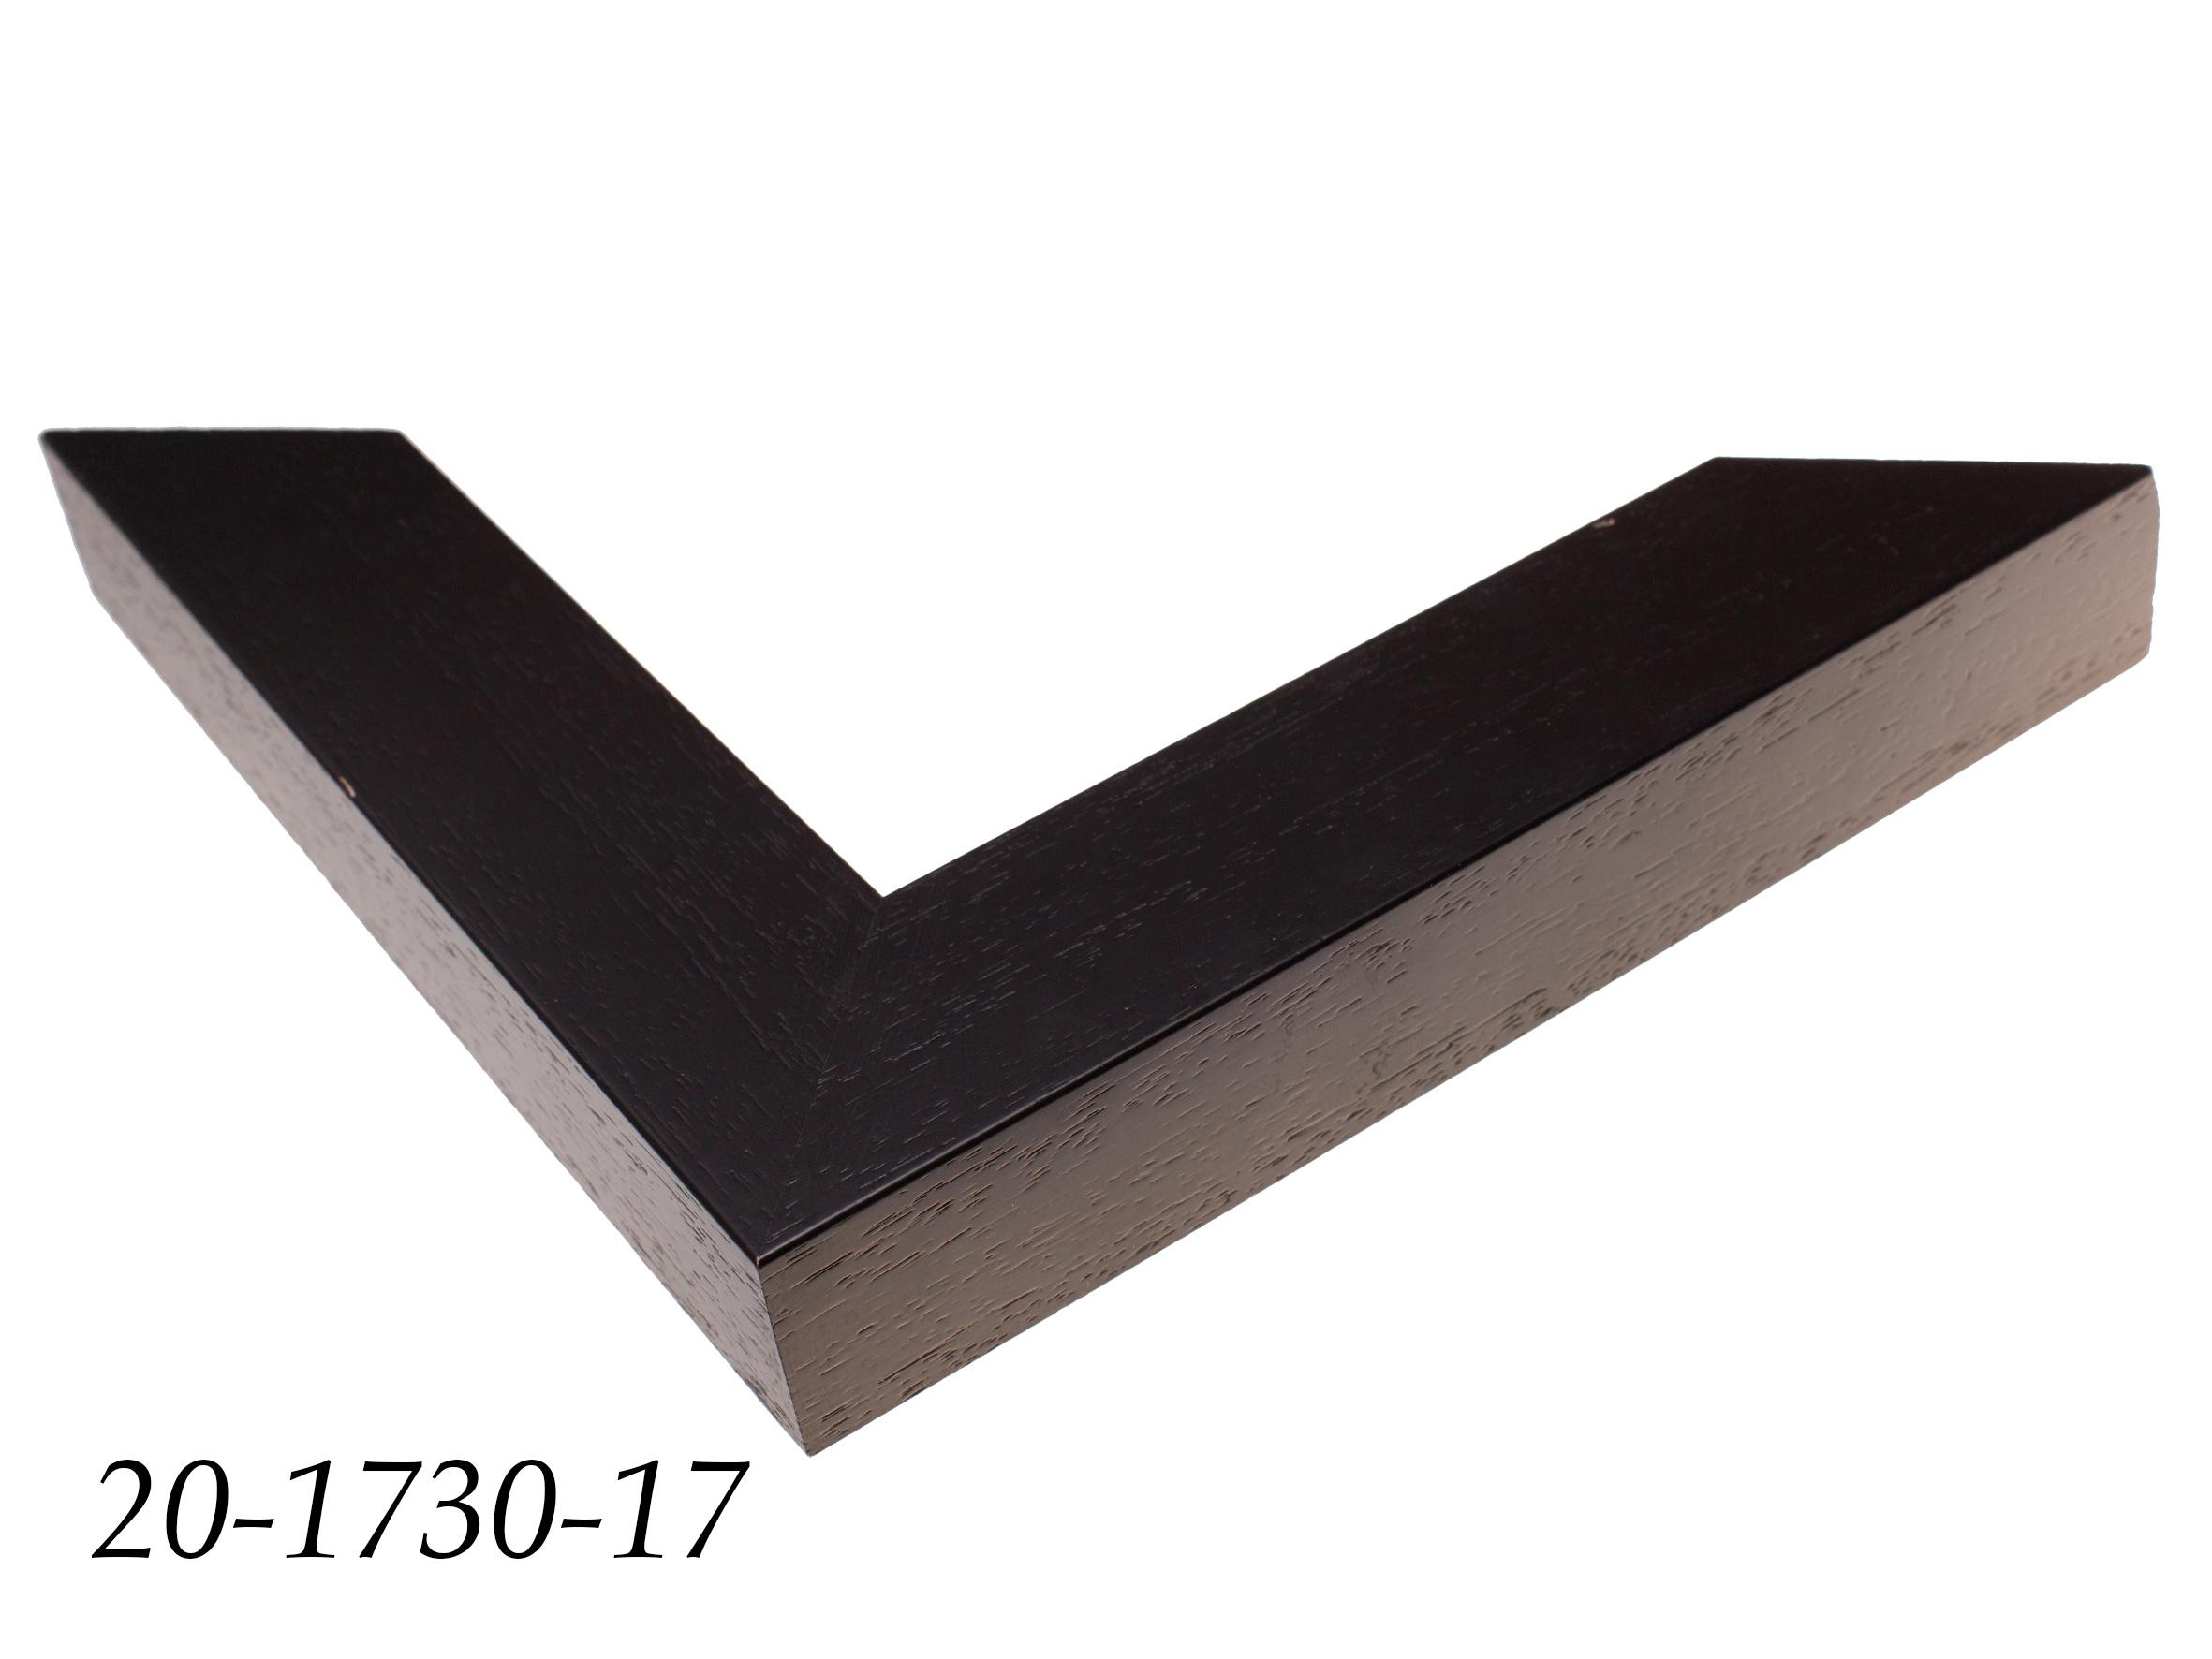 20-1730-17